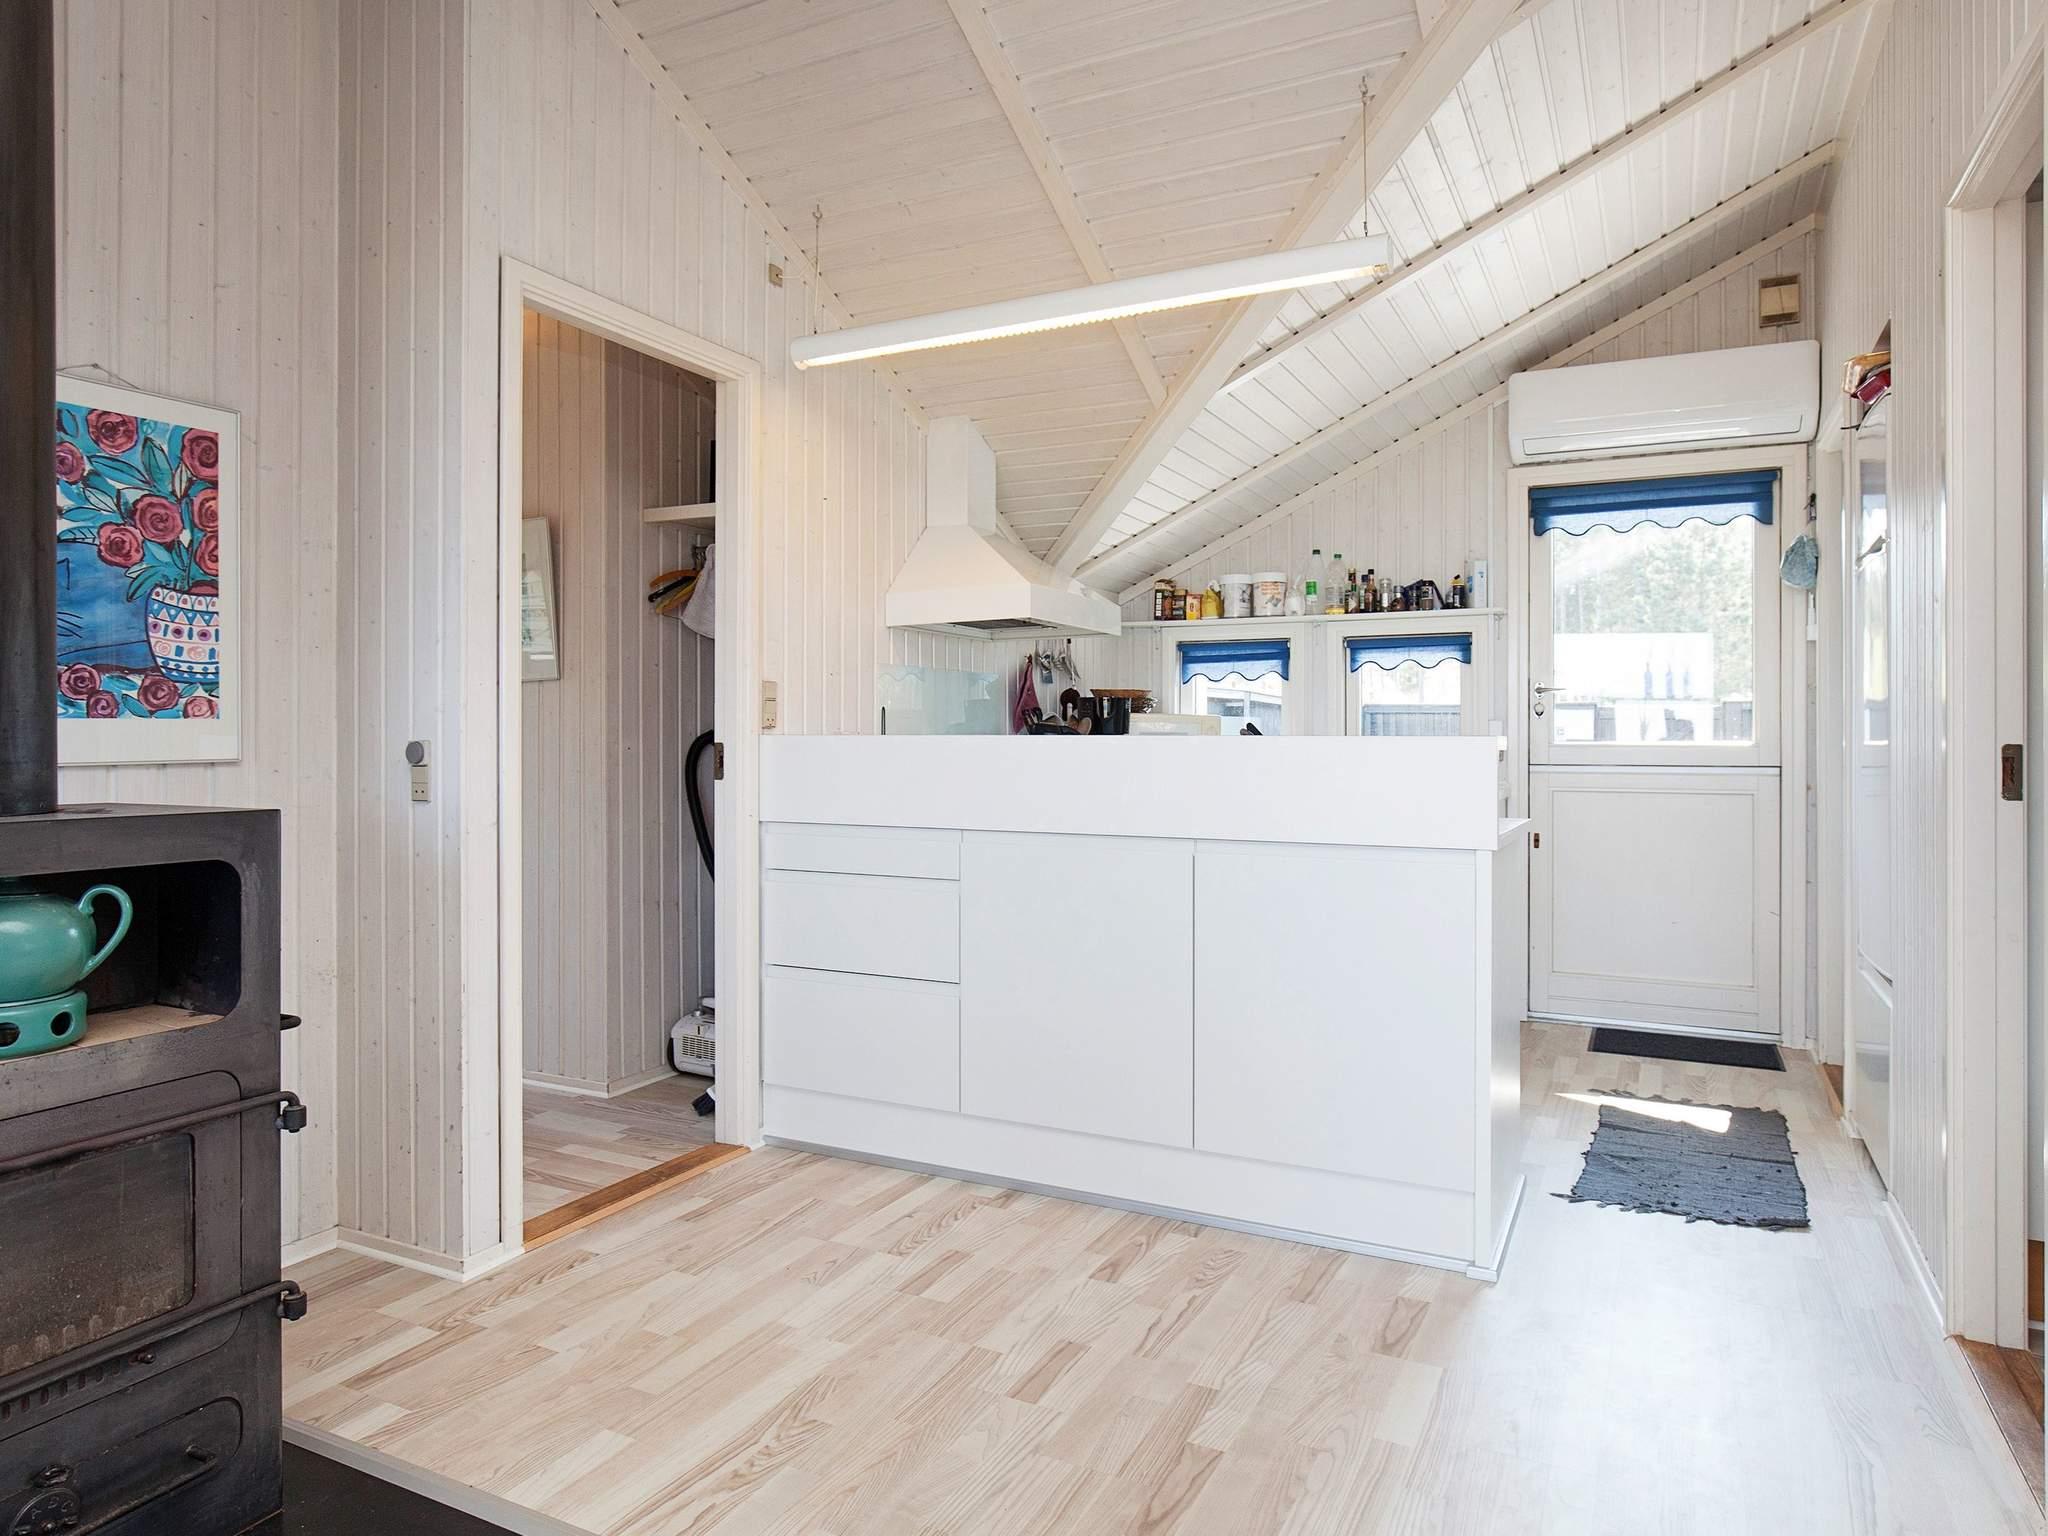 Ferienhaus Yderby Lyng (87390), Yderby, , Westseeland, Dänemark, Bild 10